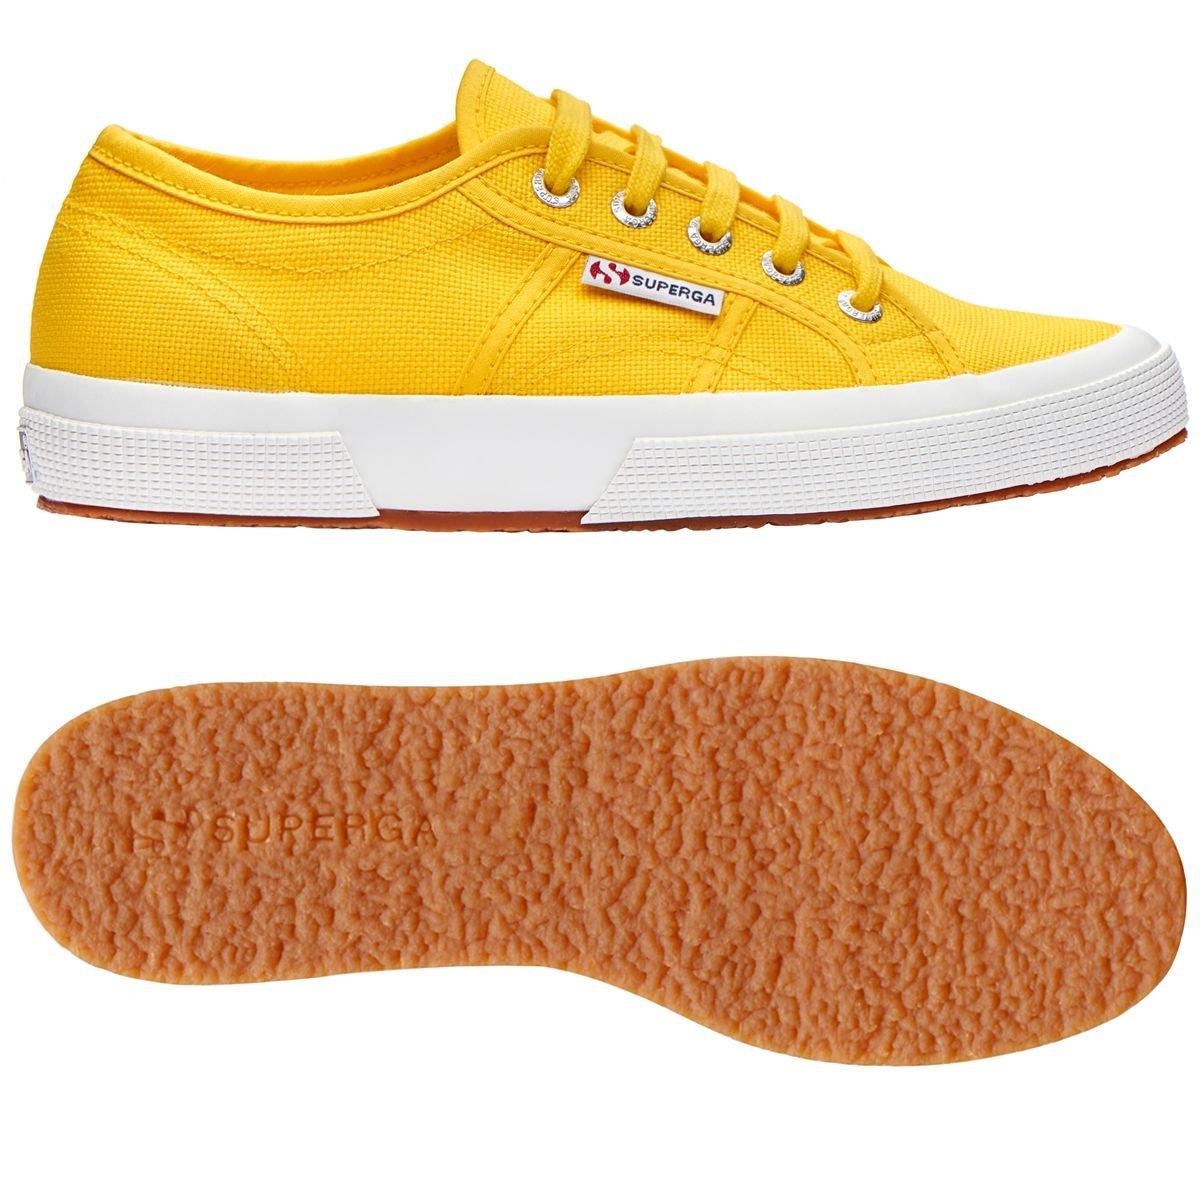 Multicolour (Gelb Tournseol) Schuhe Superga Turnschuhe Herren Damen Unisex 2750-plus Cotu Frühling Sommer Herbst Winter